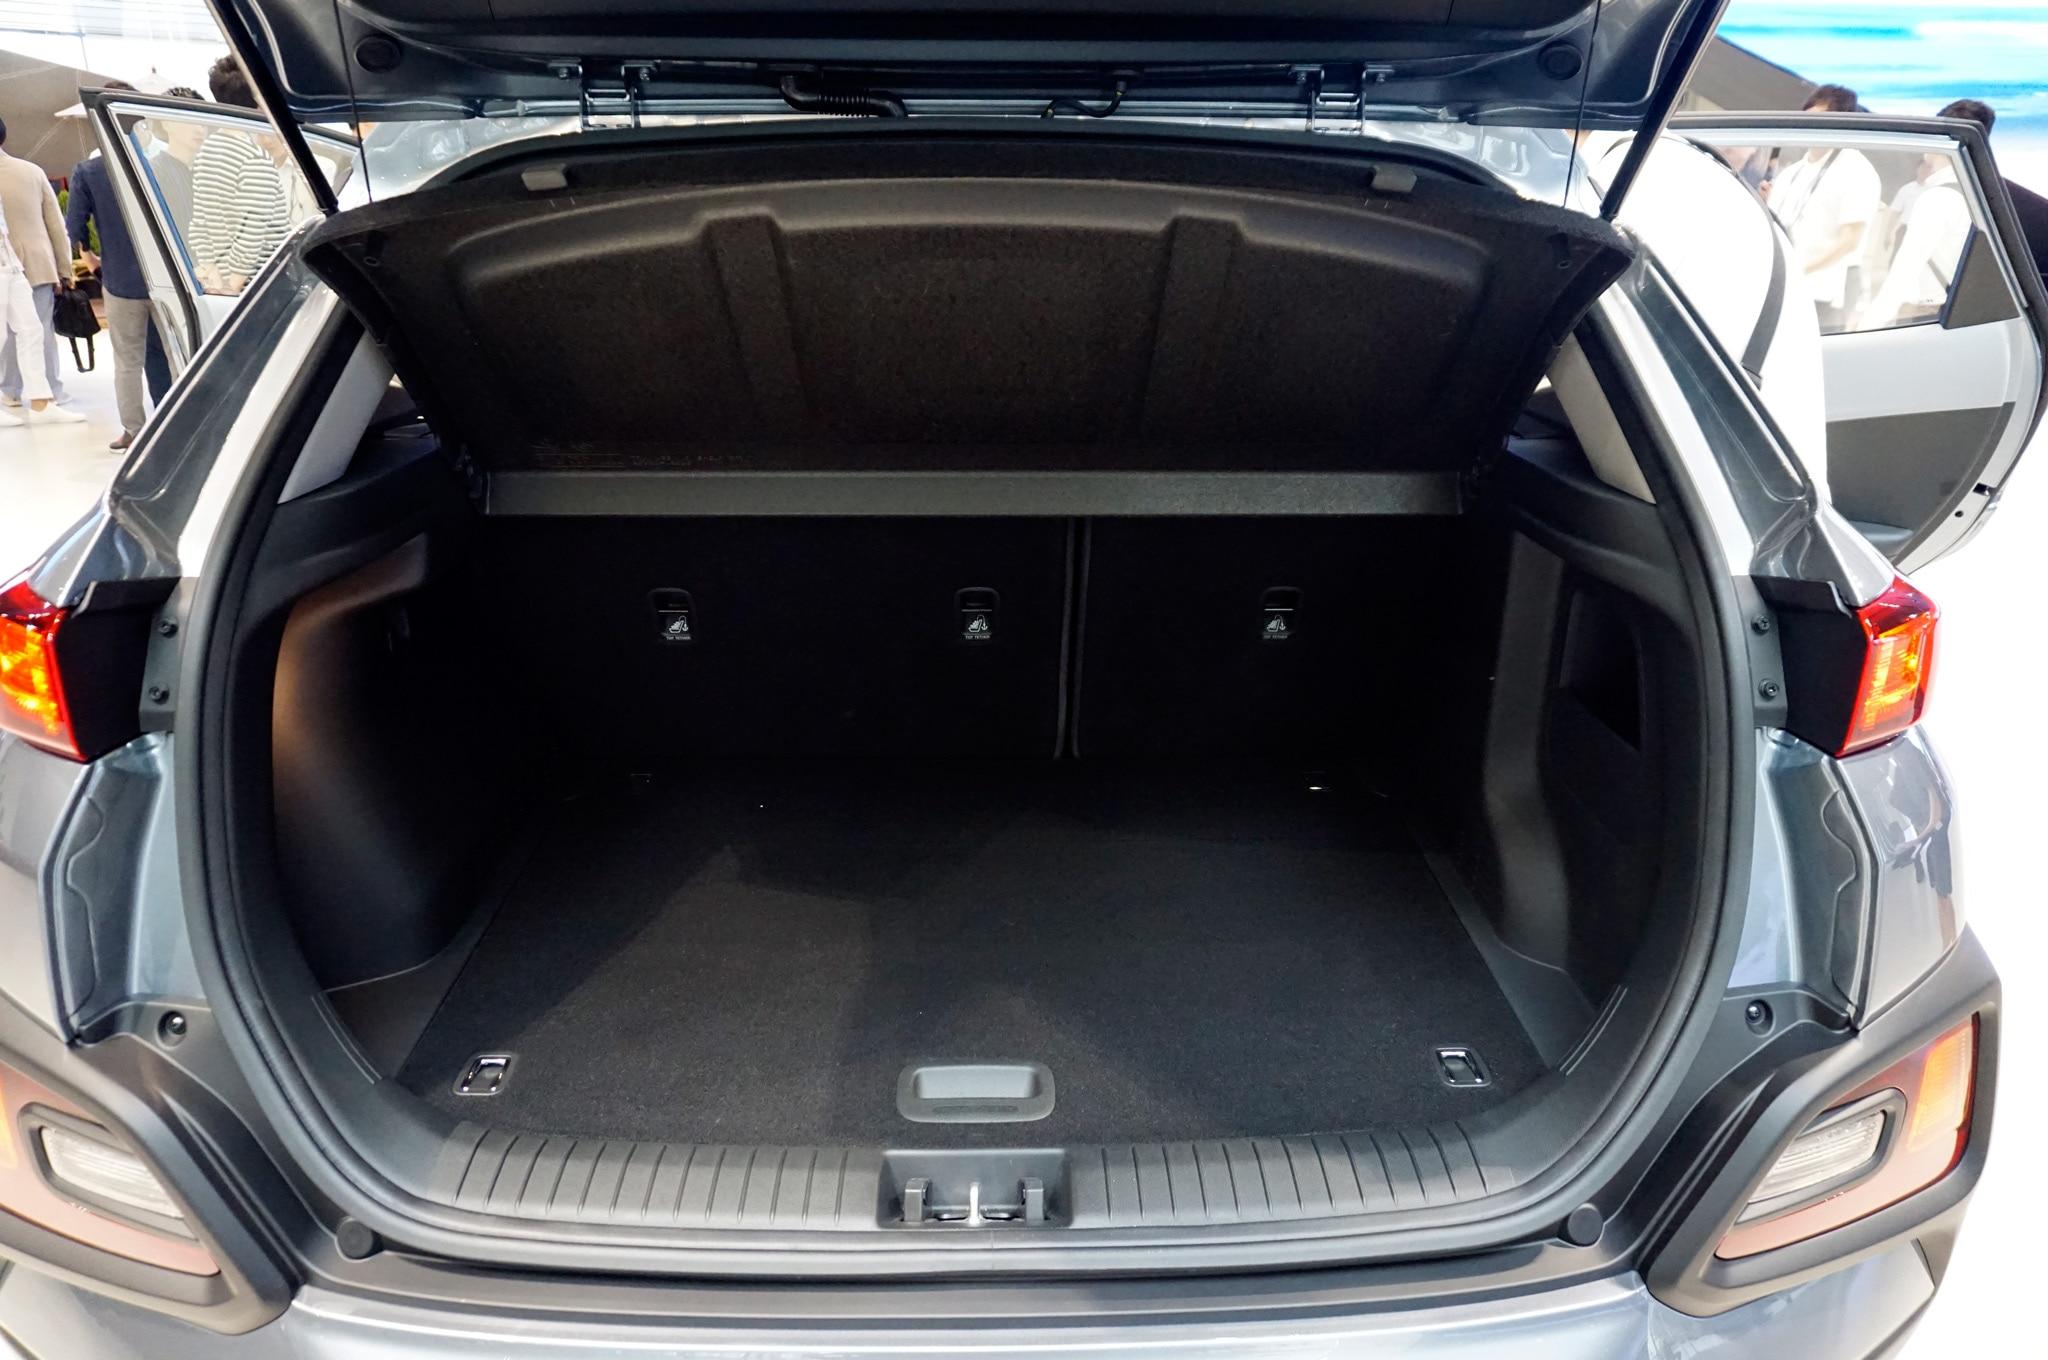 Renegade 2018 Interior >> 2018 Hyundai Kona Debuts Fresh Face, New Small SUV Platform | Automobile Magazine